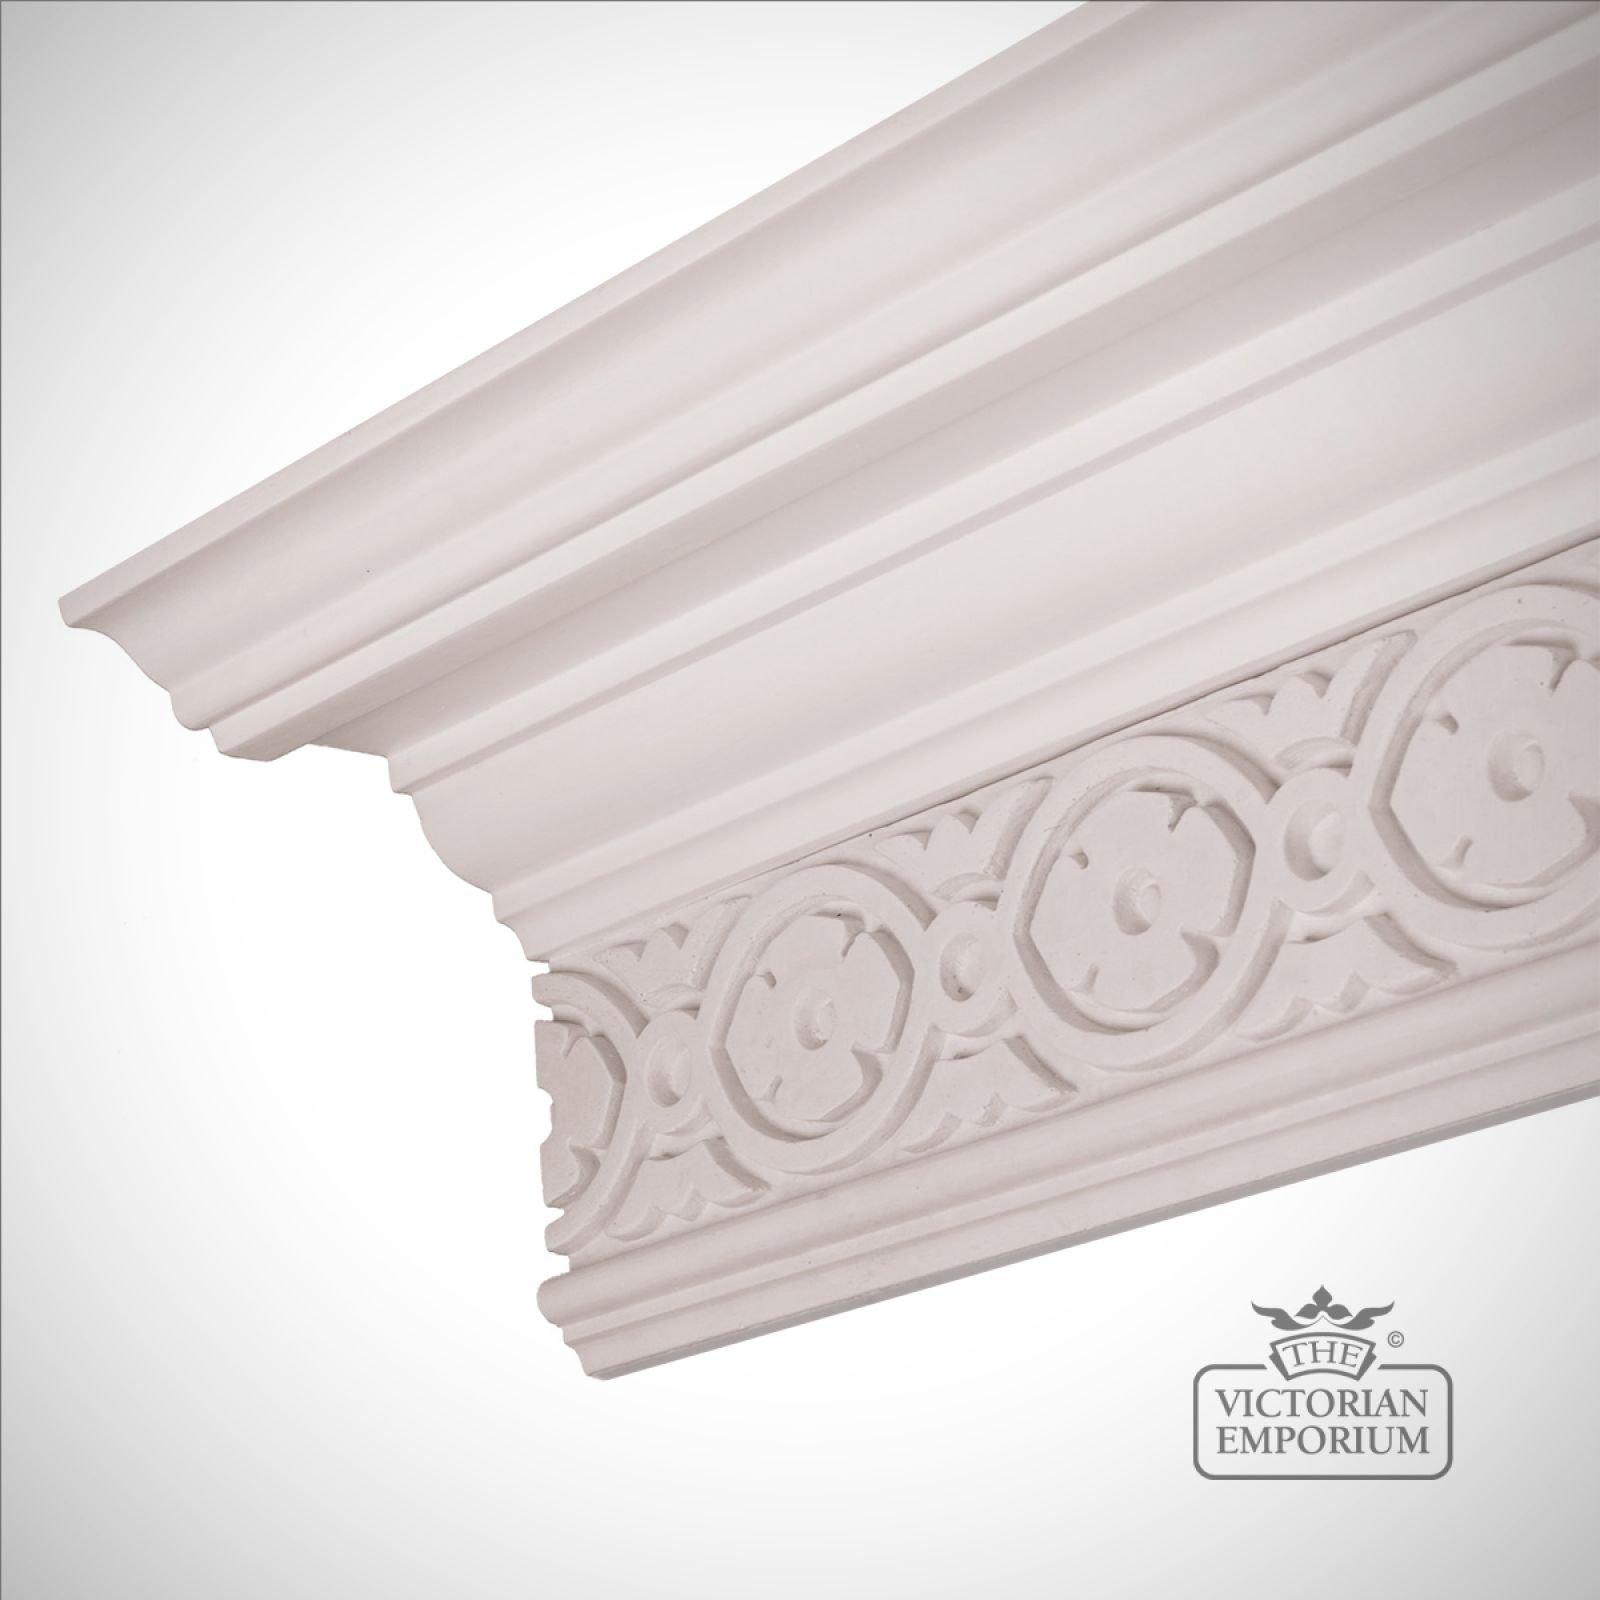 Ornate Regency Coving With Wall Bank In Geometric Pattern